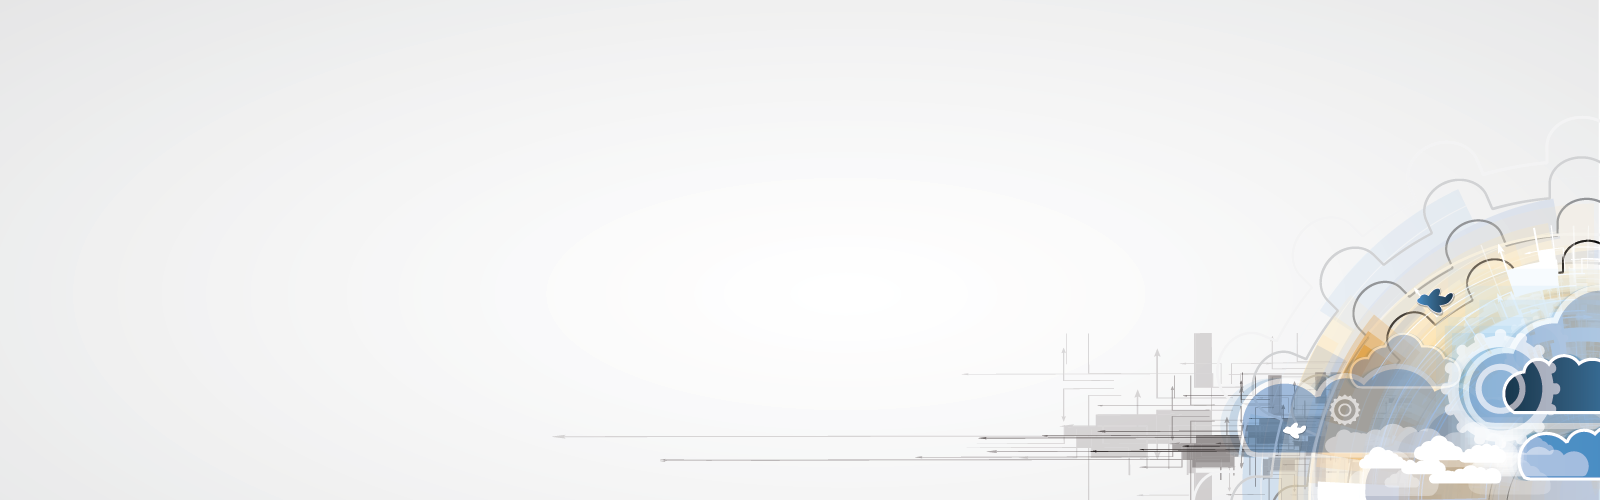 navigator_business_solutions_header.png